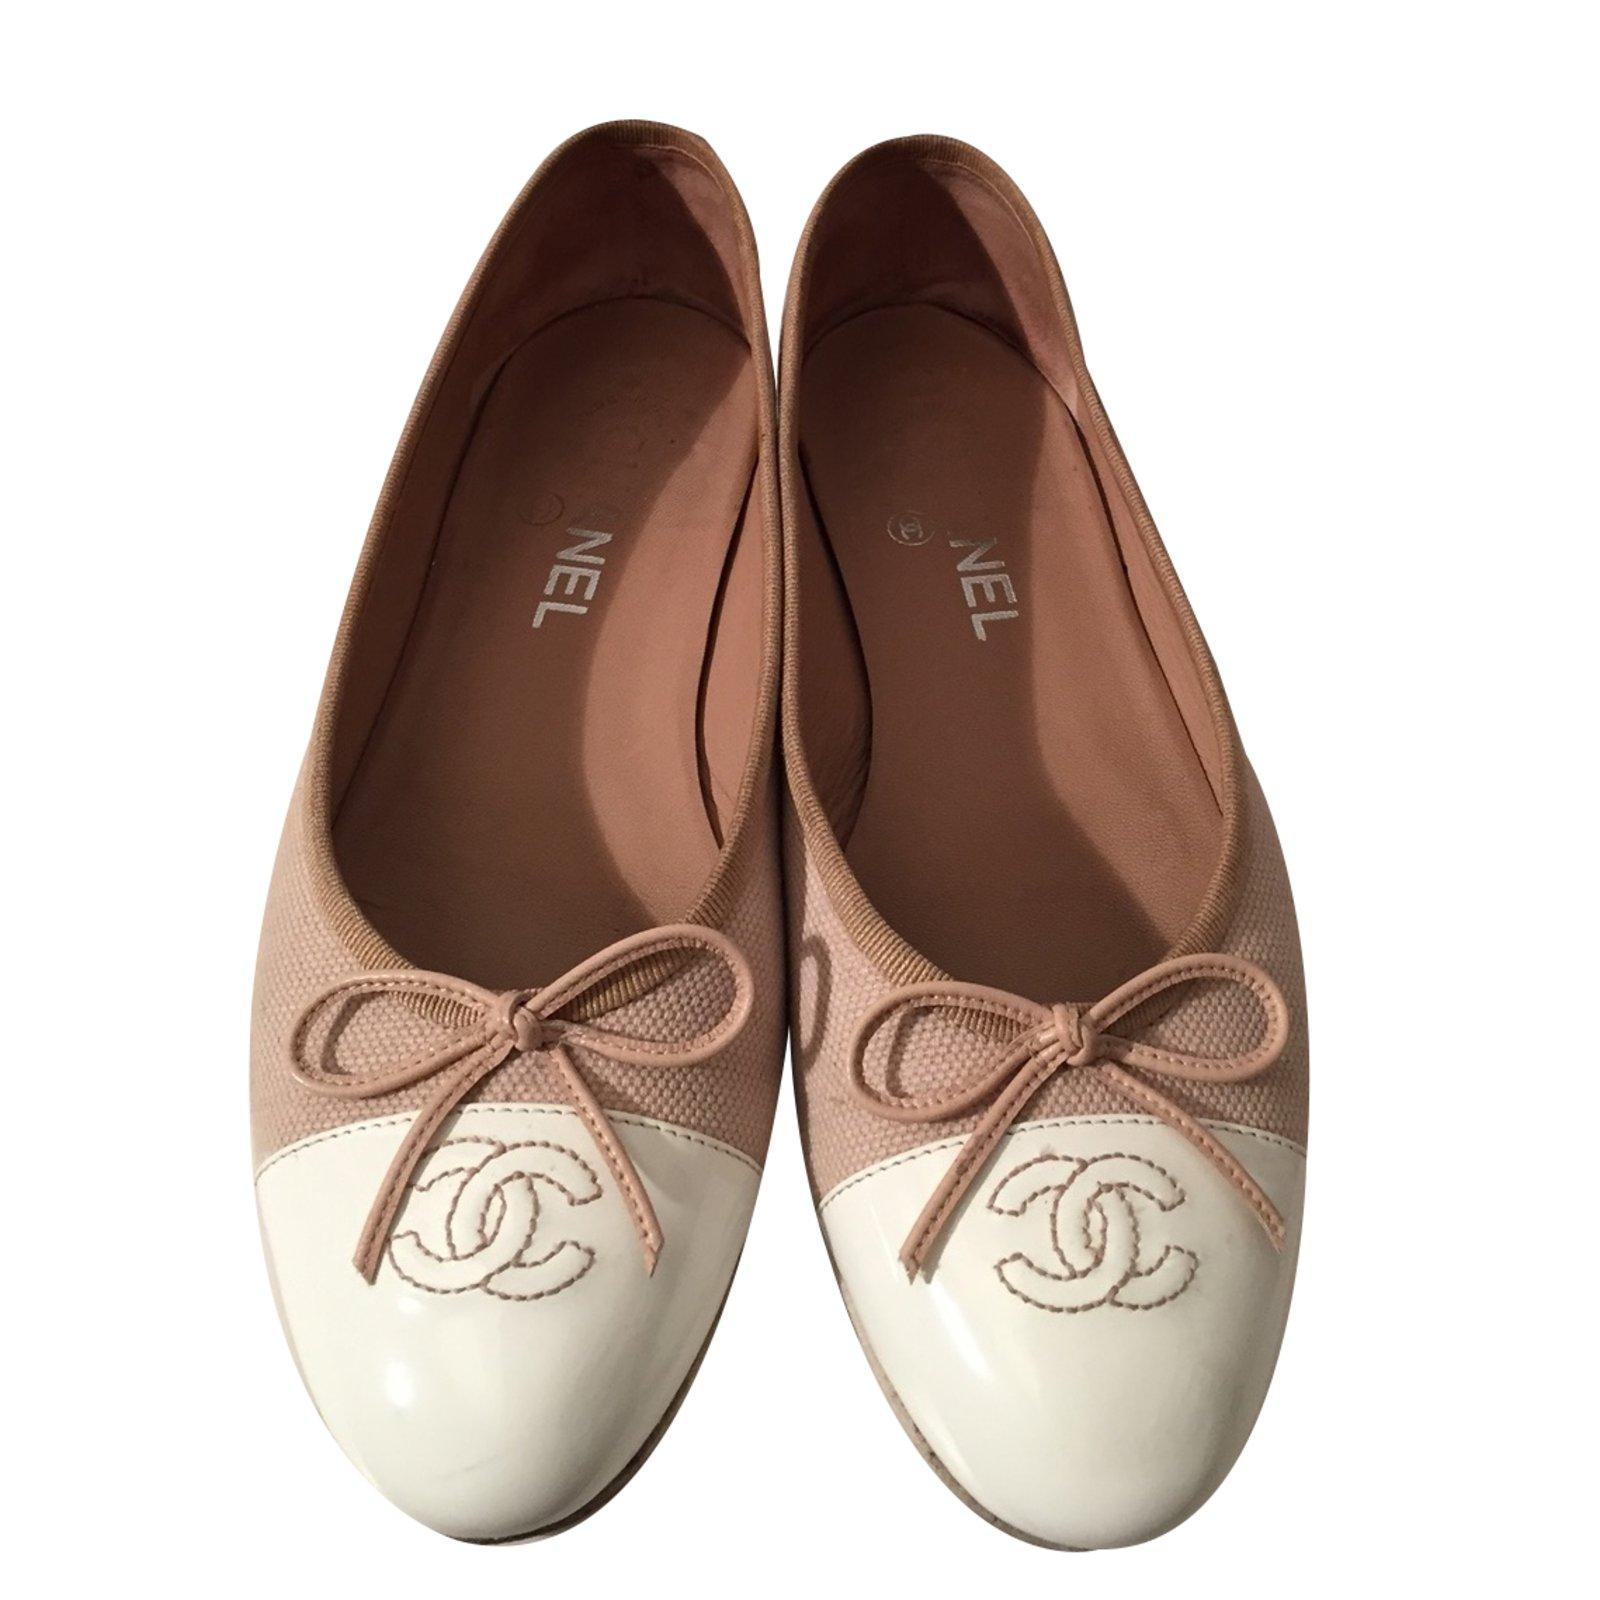 chanel ballerina beige